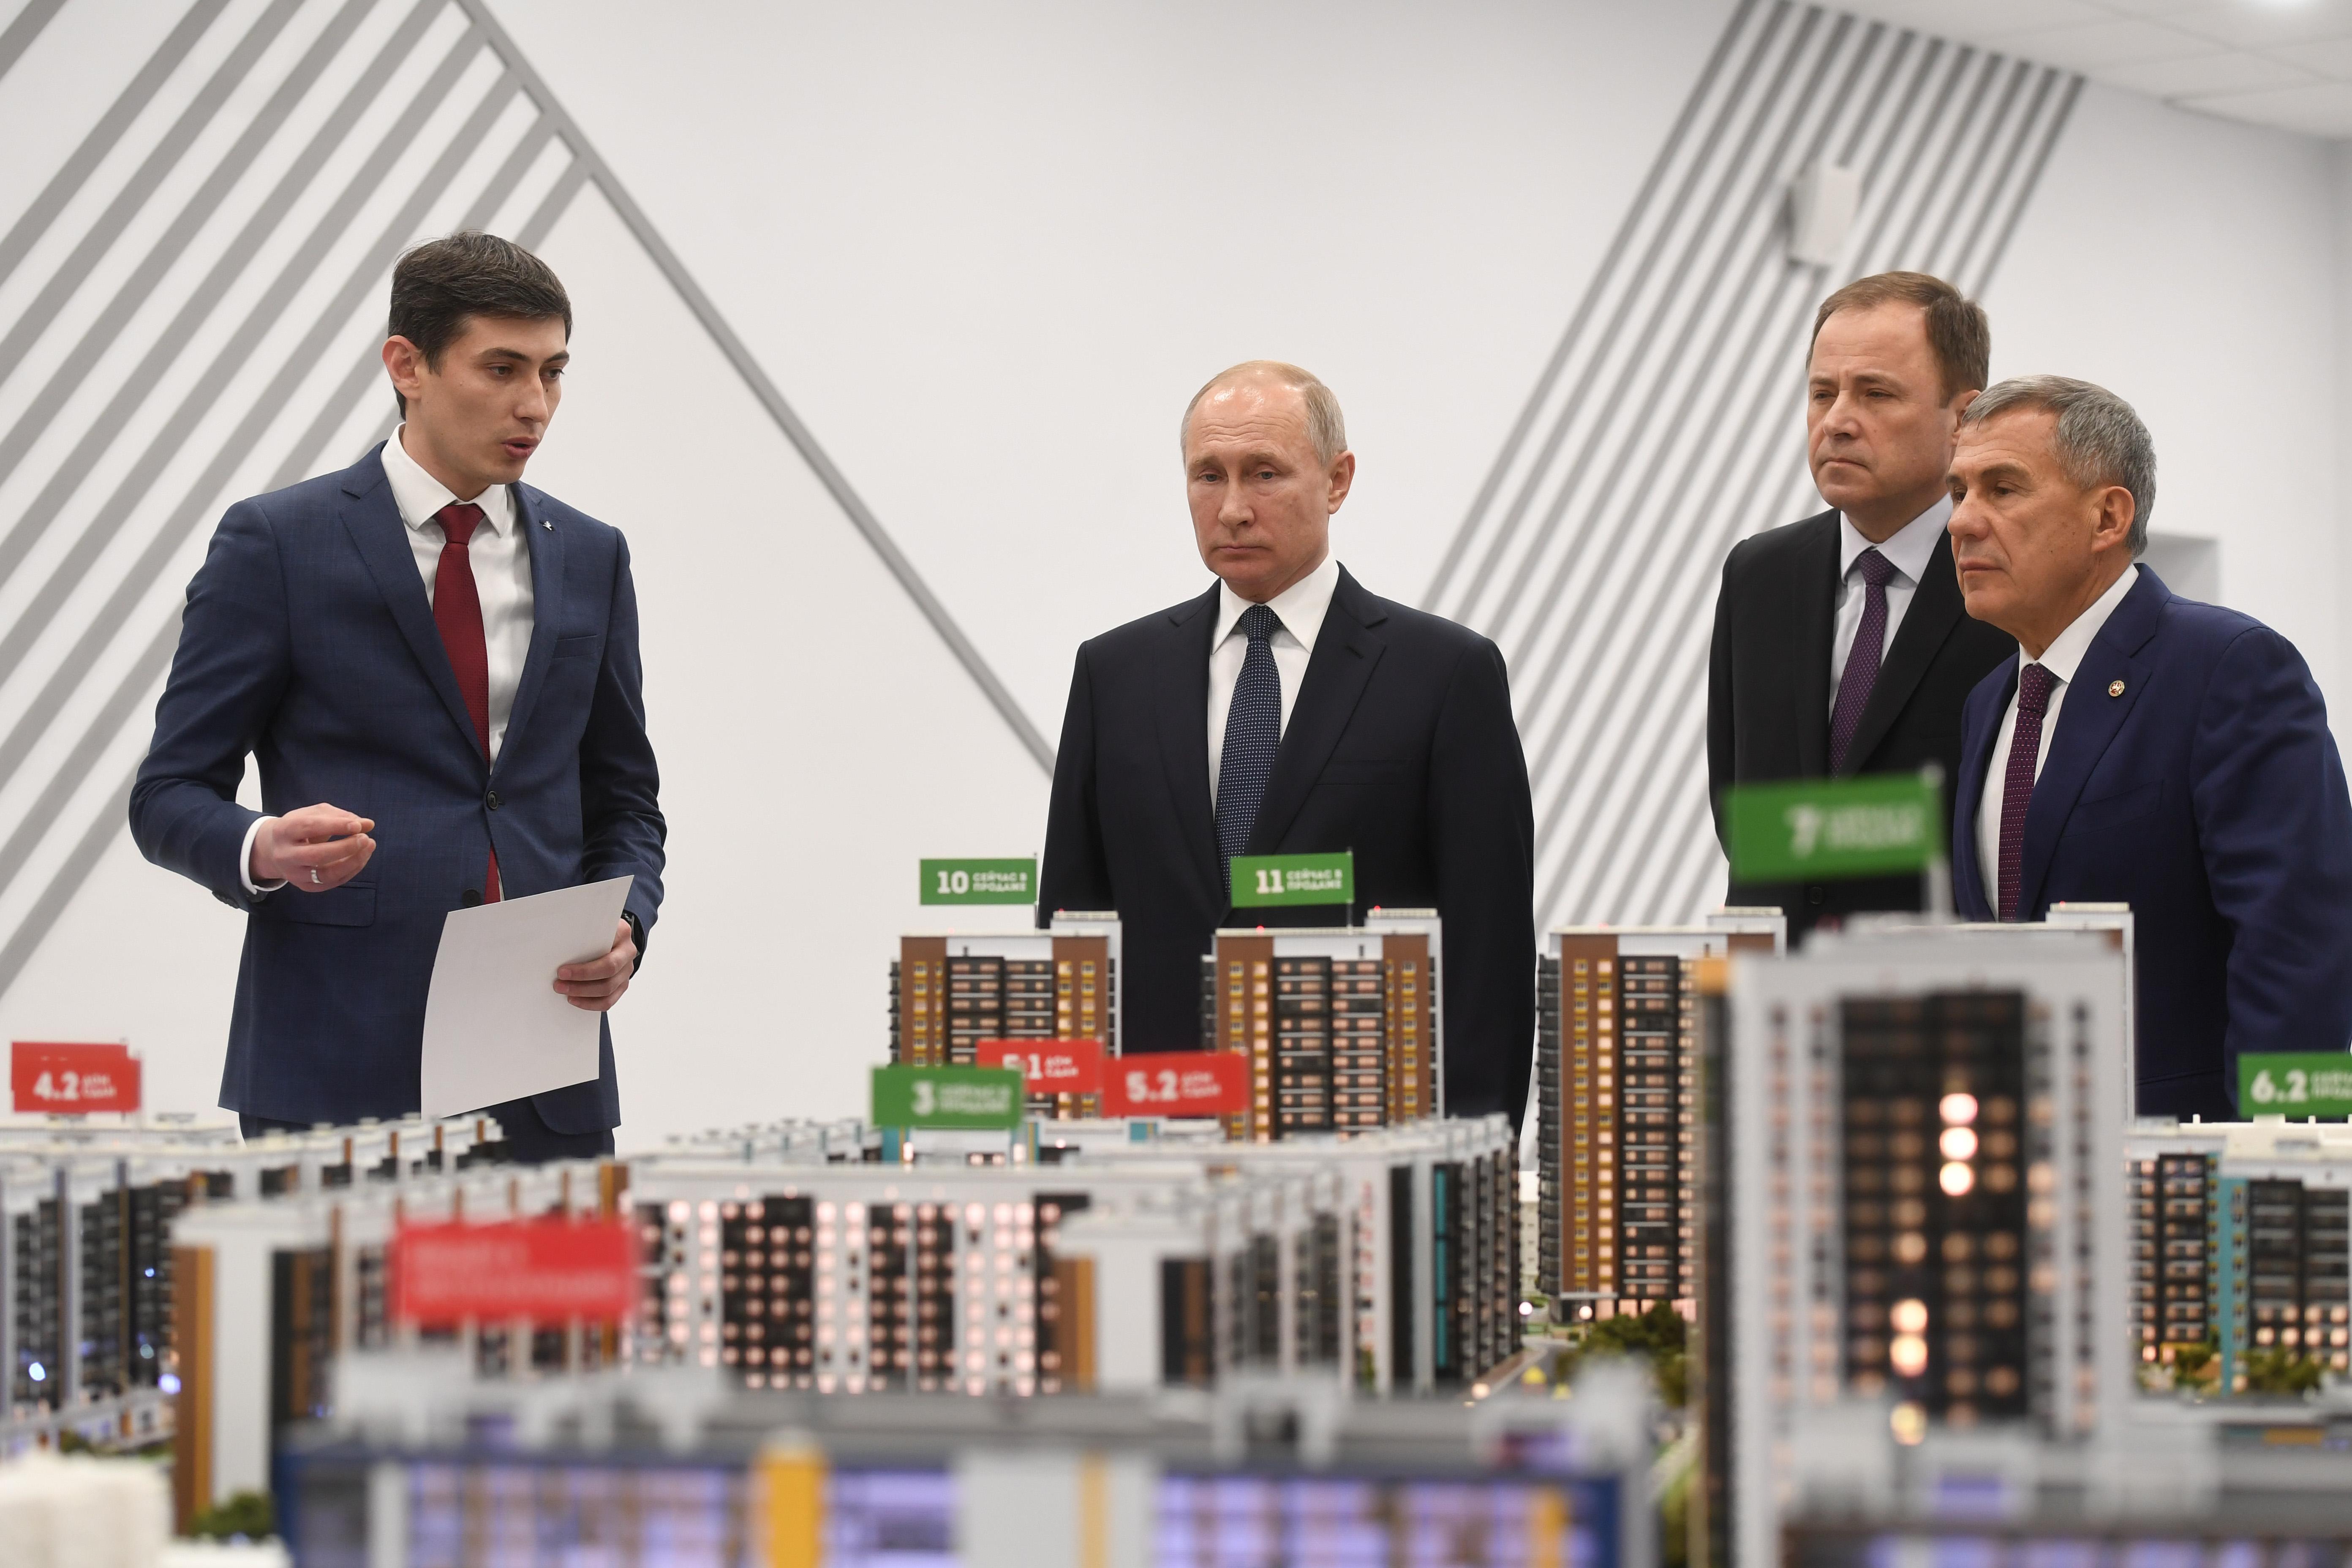 слева направо: гендиректор«Унистрой» РадикСалимгараев, президент РФ Владимир Путин, полпред в ПФО Игорь Комаров, президент РТ Рустам Минниханов